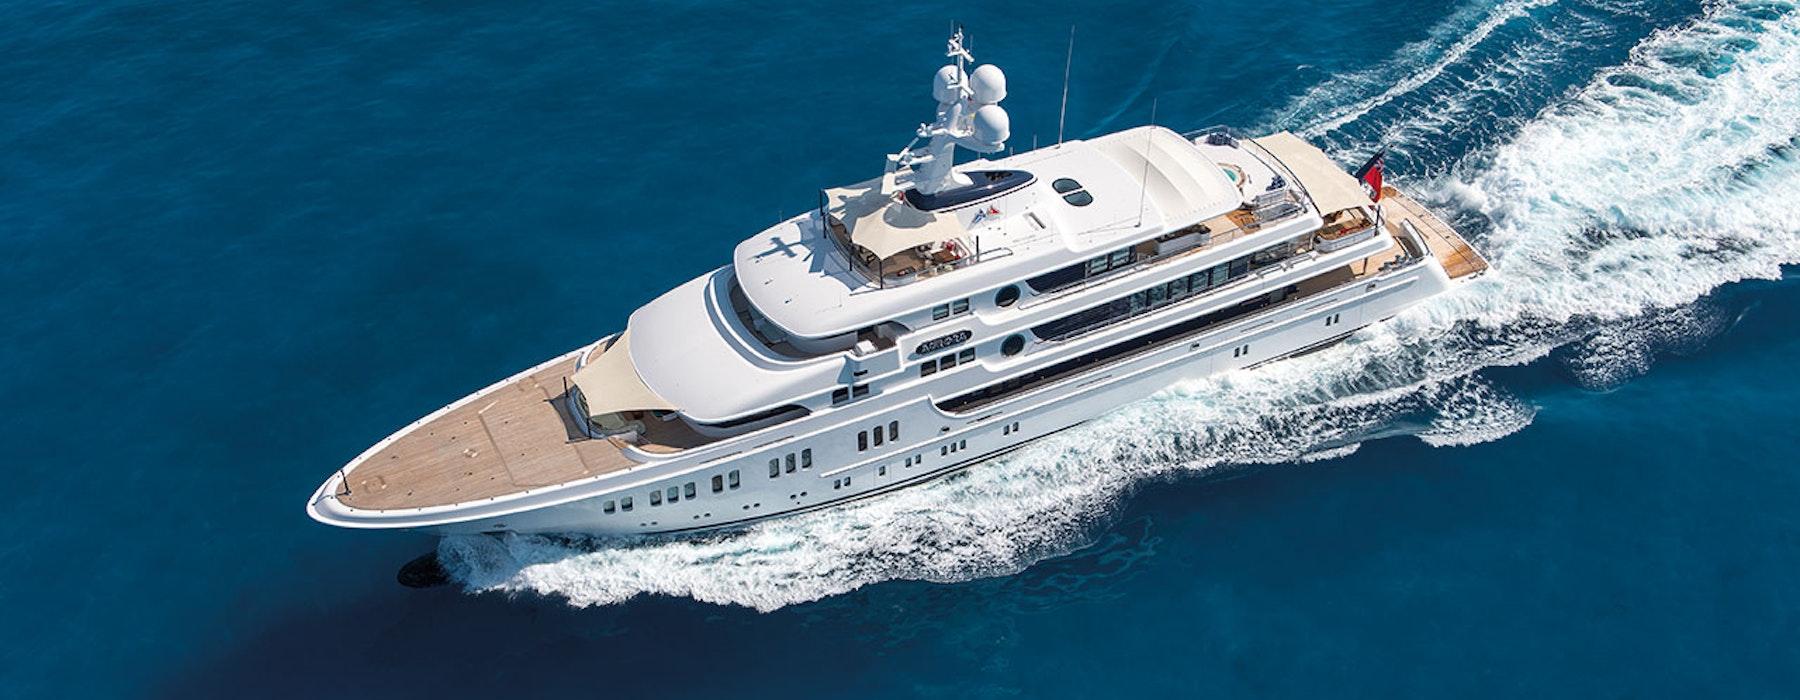 Yacht Construction Specialists - Moran Yacht & Ship